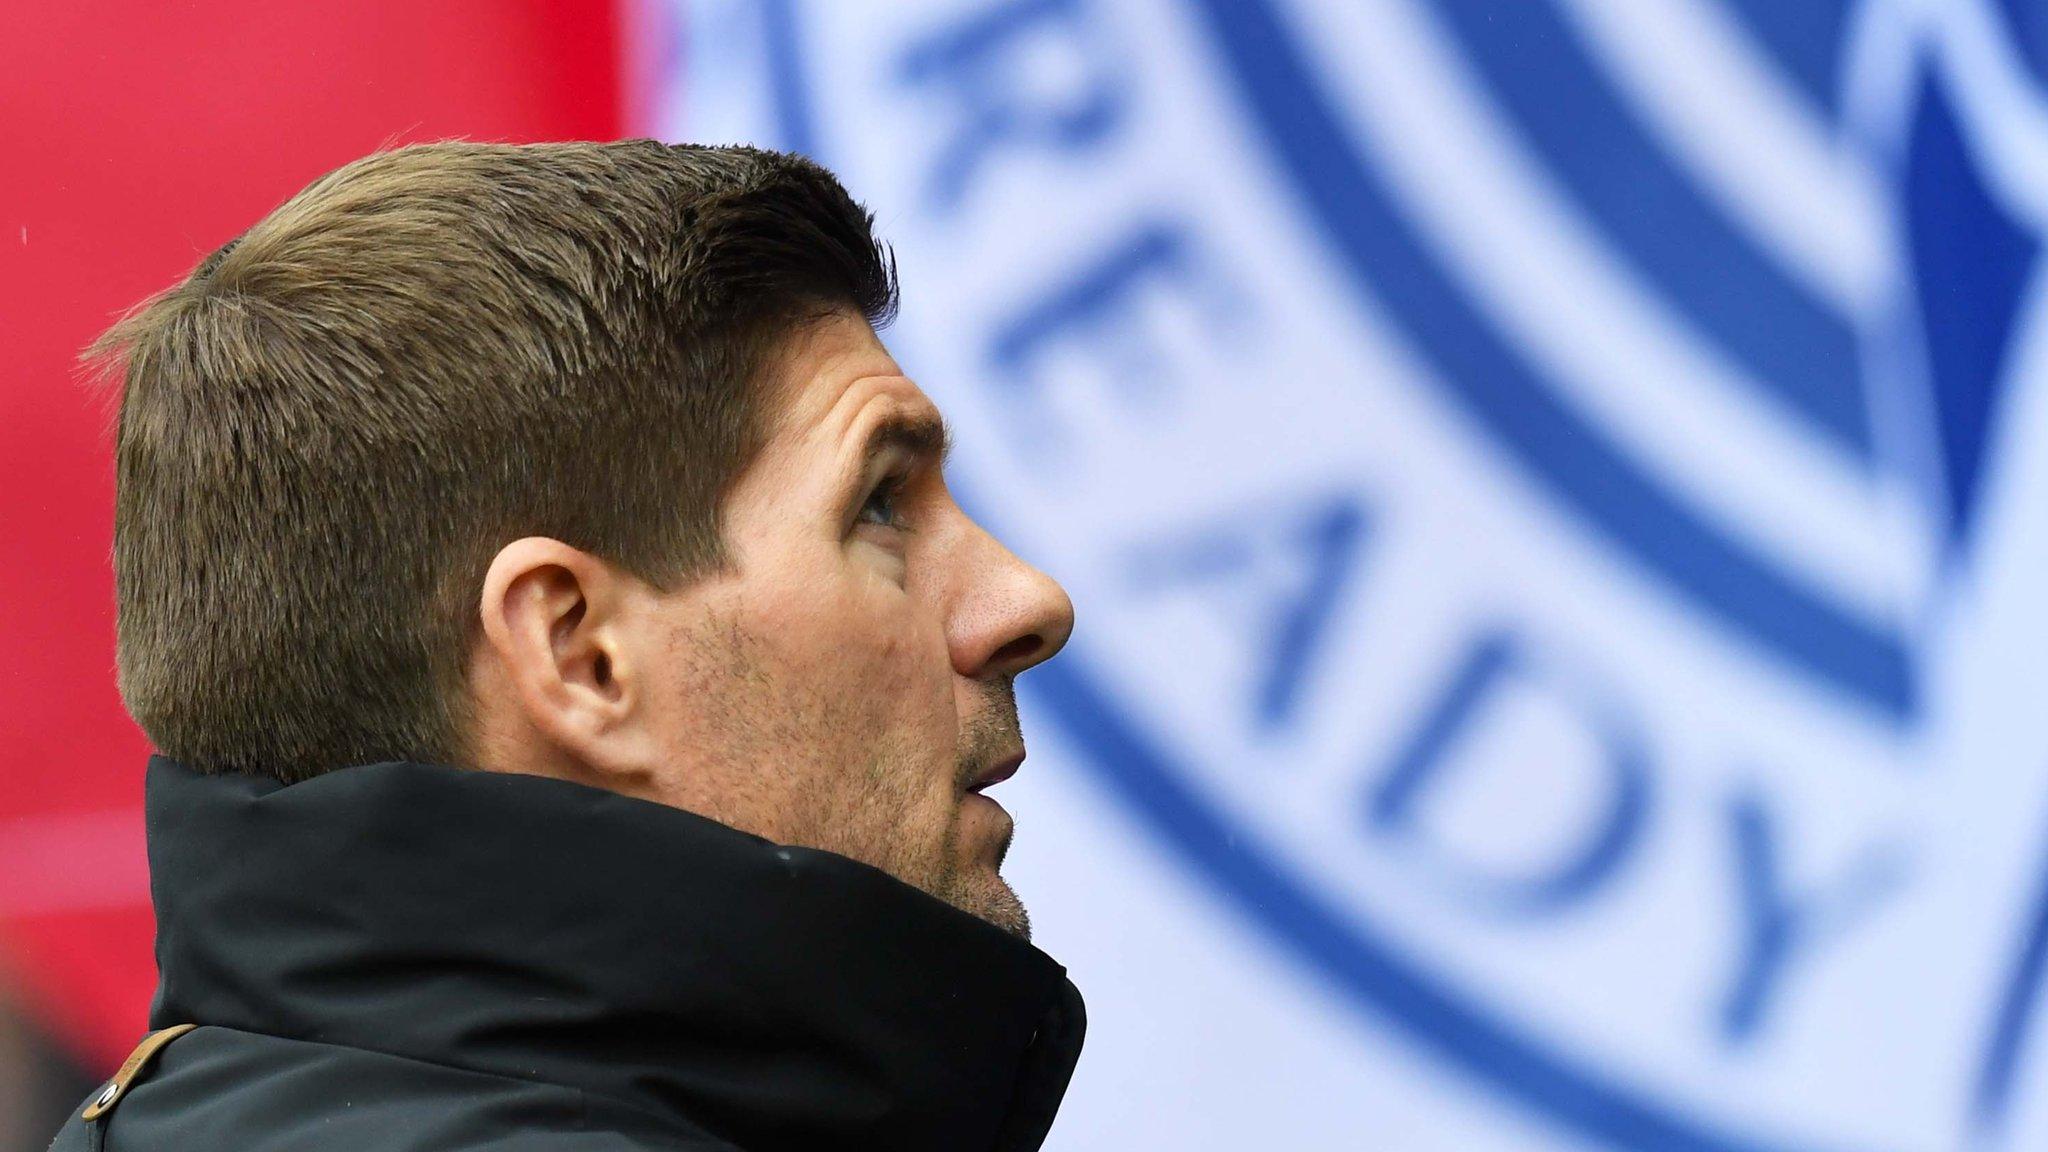 Progress, pressure & the long road ahead - Steven Gerrard's first year at Rangers